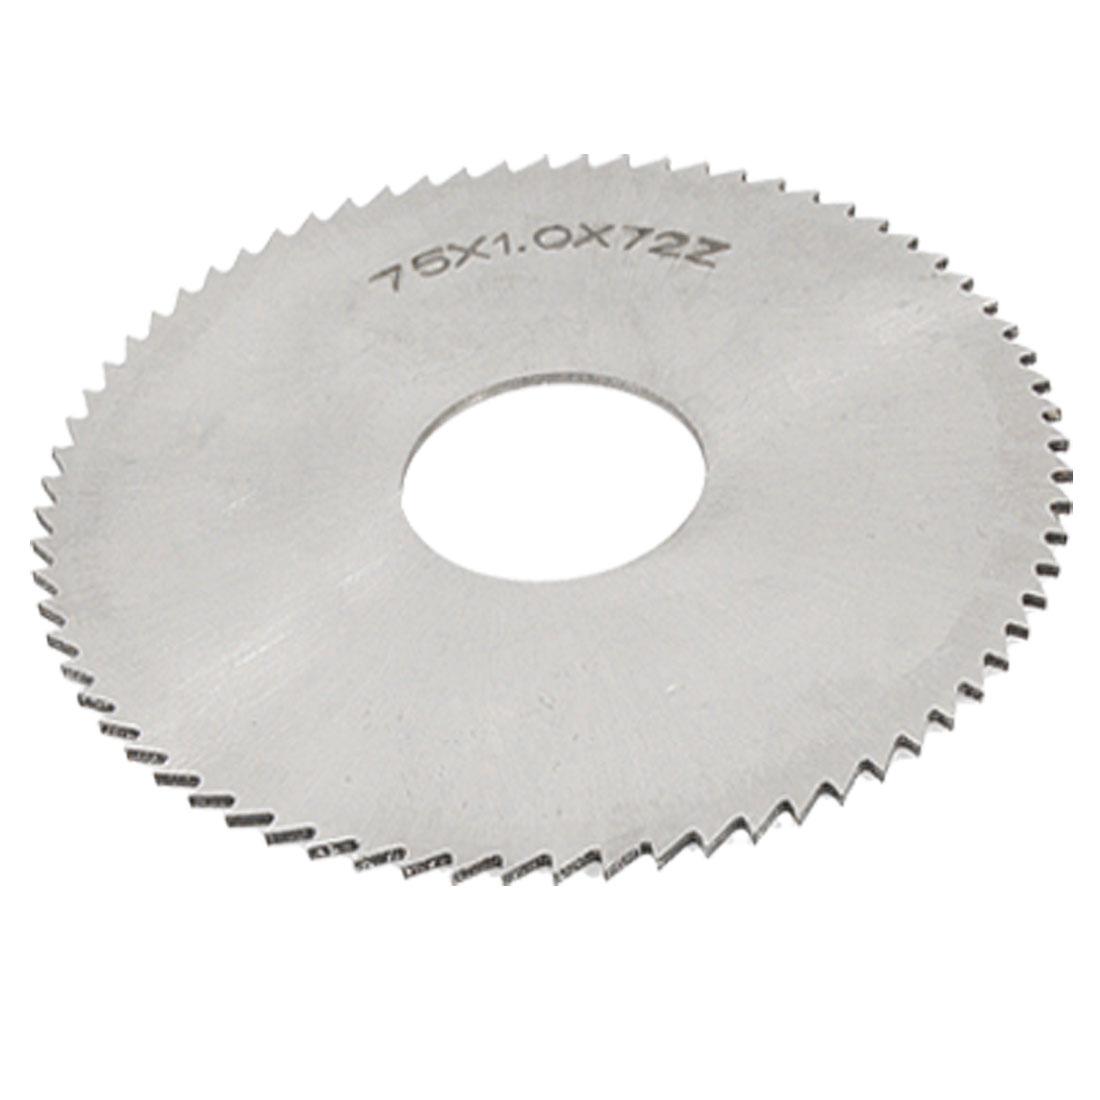 72T Silver Tone Milling Cutter 75 x 1 x 22mm Circular Slitting Saw